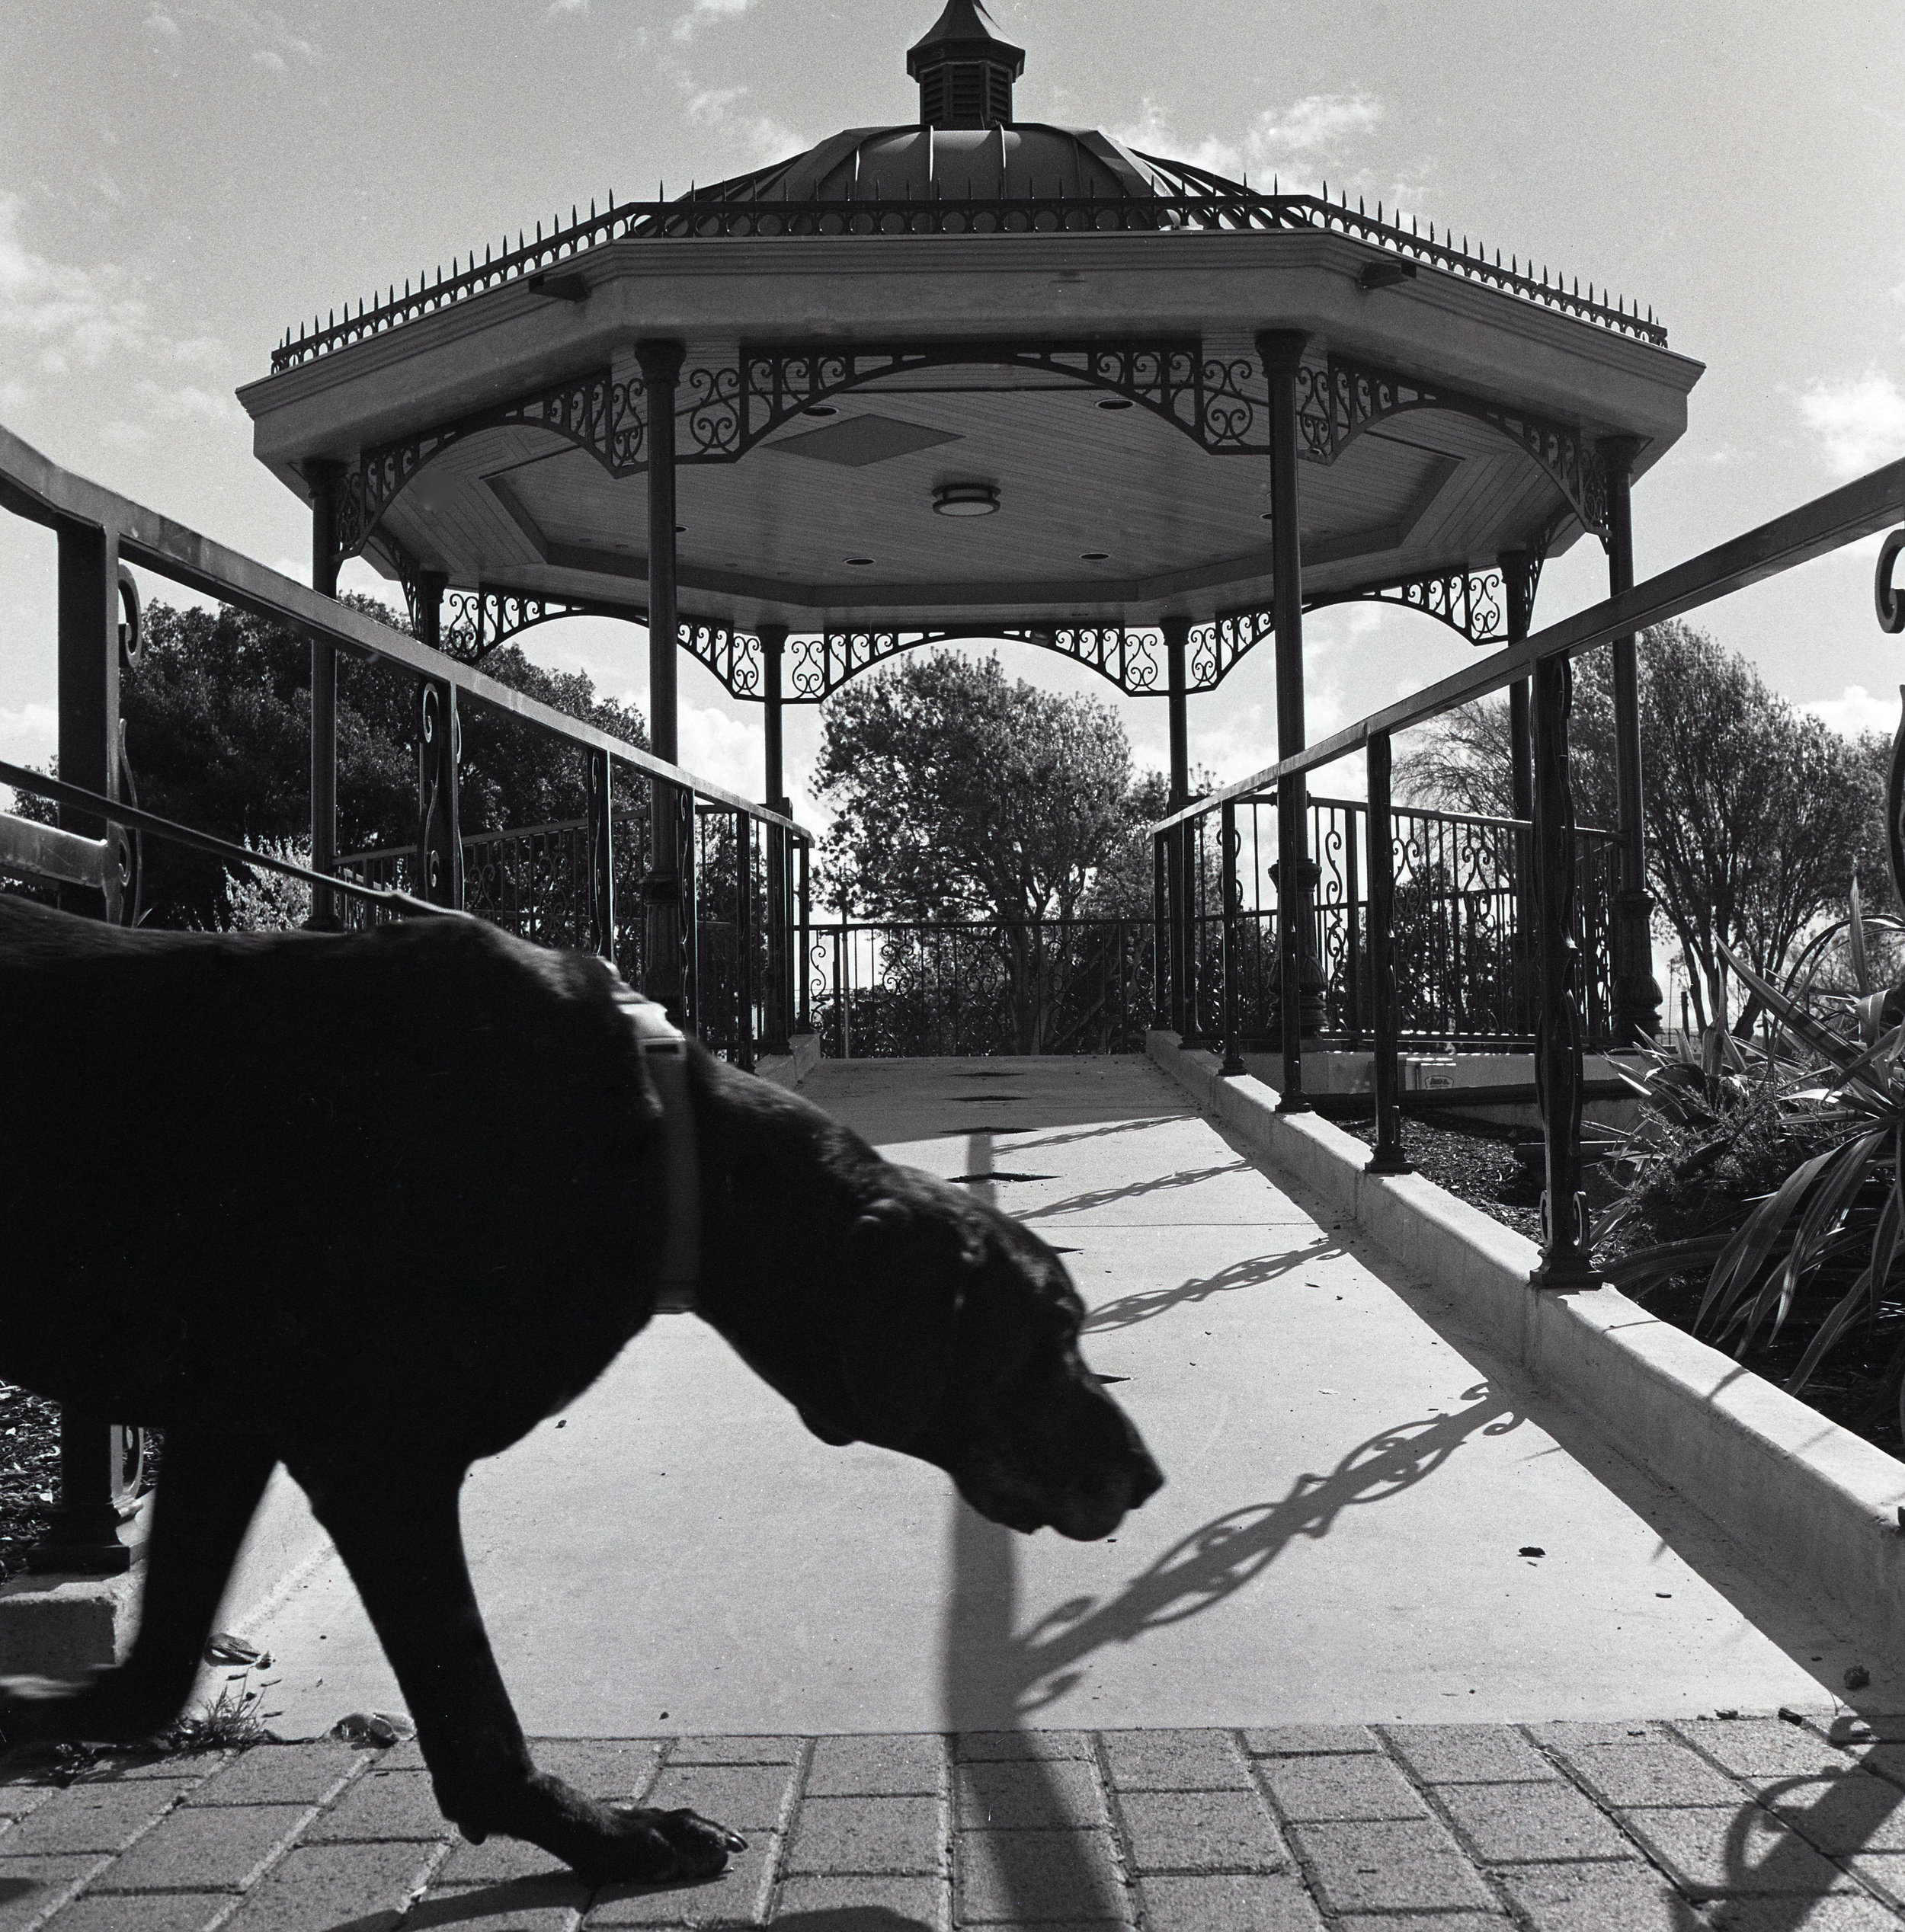 Perro y Kiosko,Salinas,CA, 2017.jpg